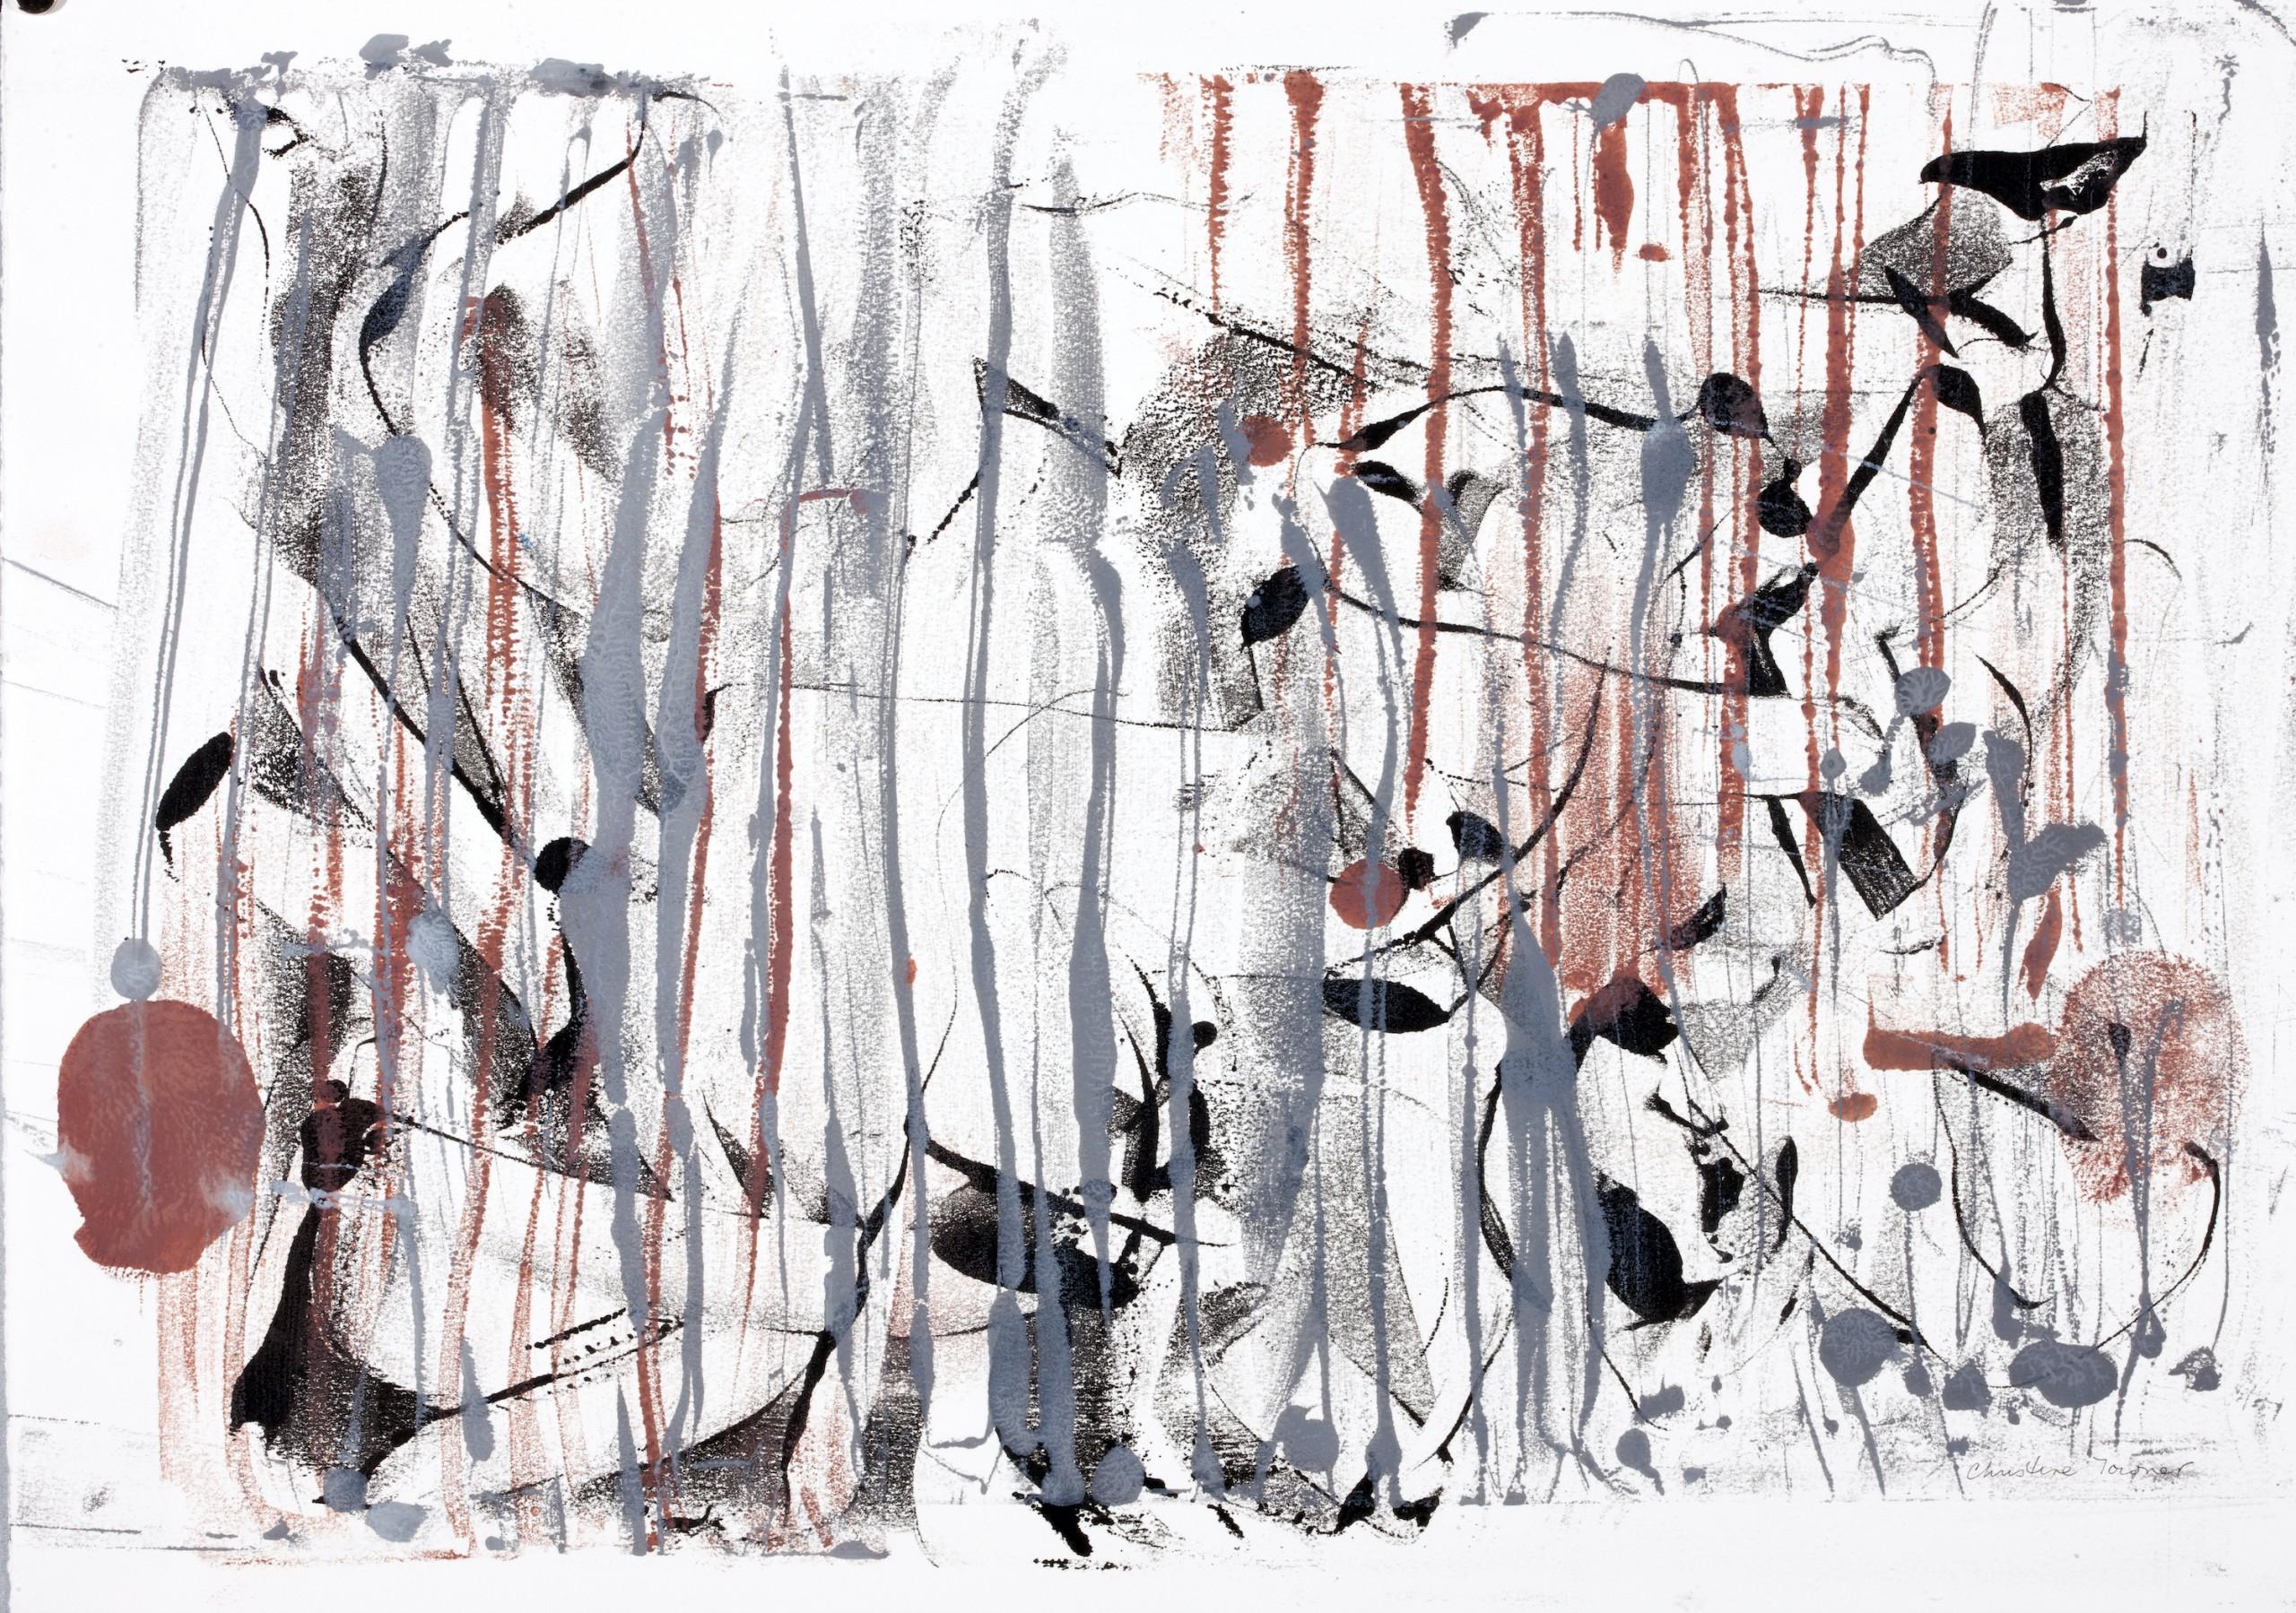 Dusk, Encaustic on Rives Paper, 30.5